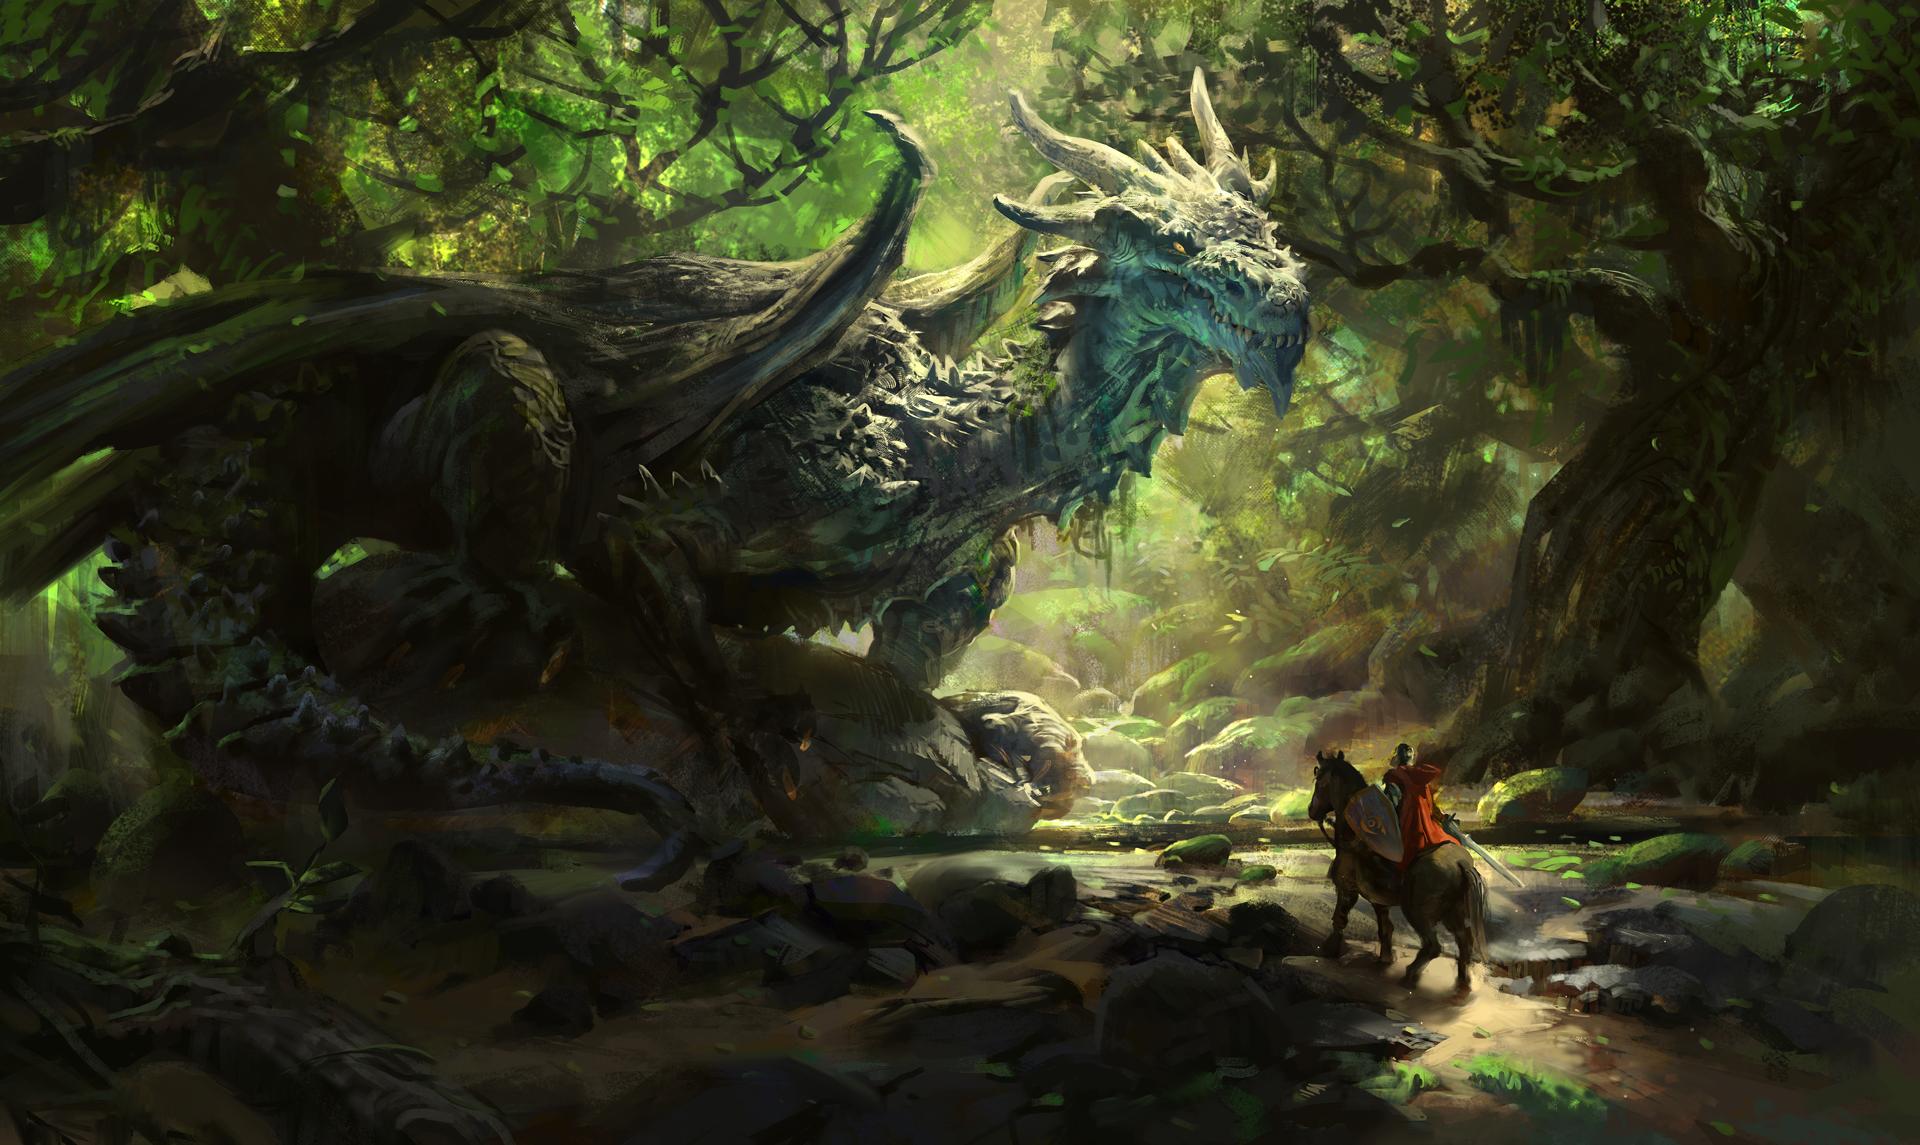 Wallpaper Dragon Horse Nature Warrior Trees Fantasy